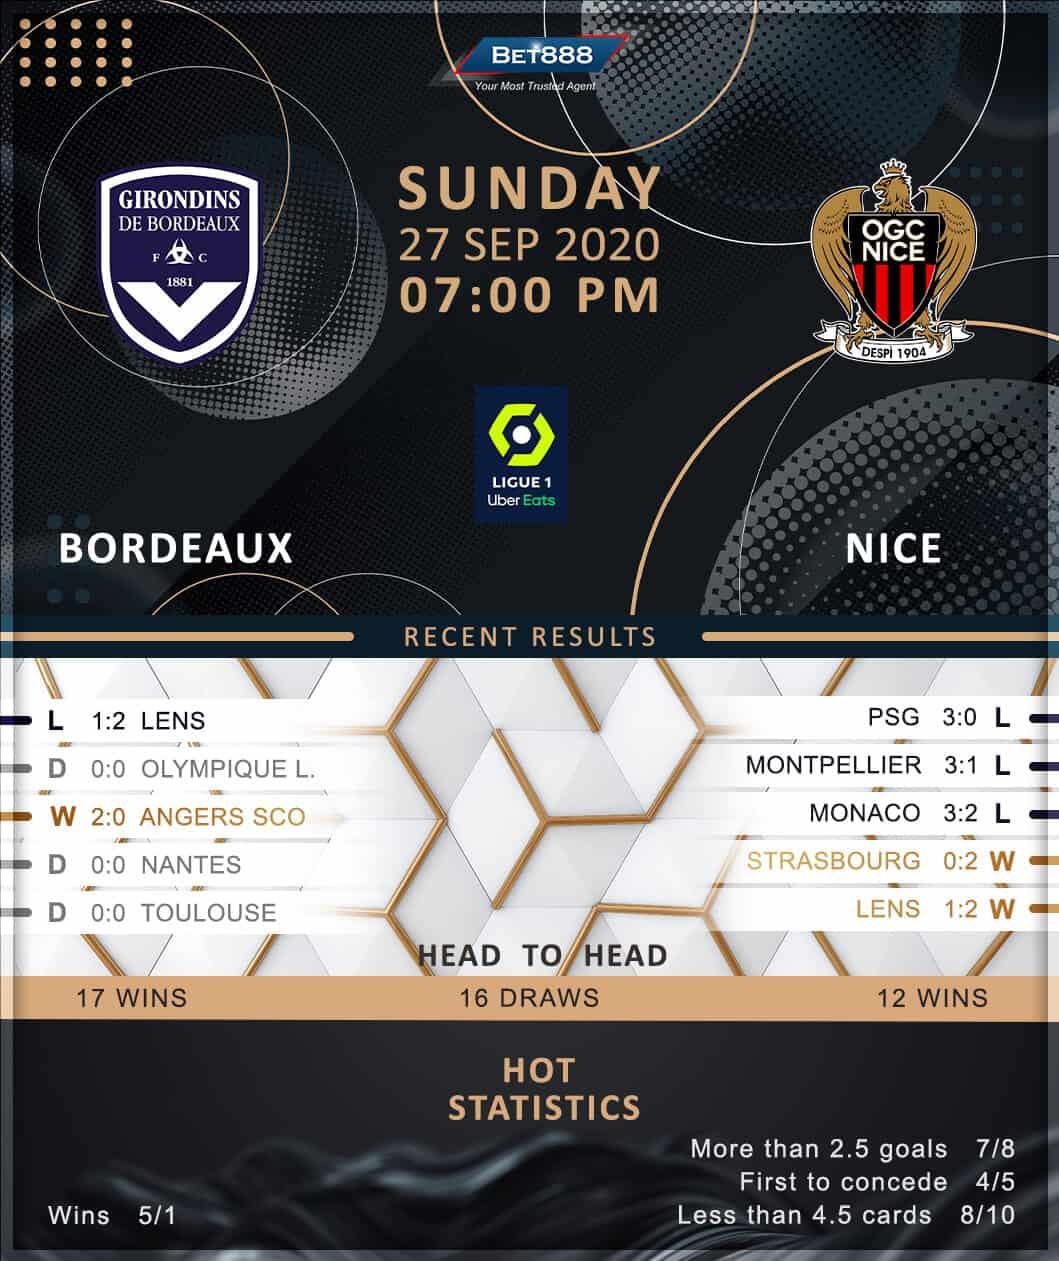 Bordeaux vs Nice 27/09/20